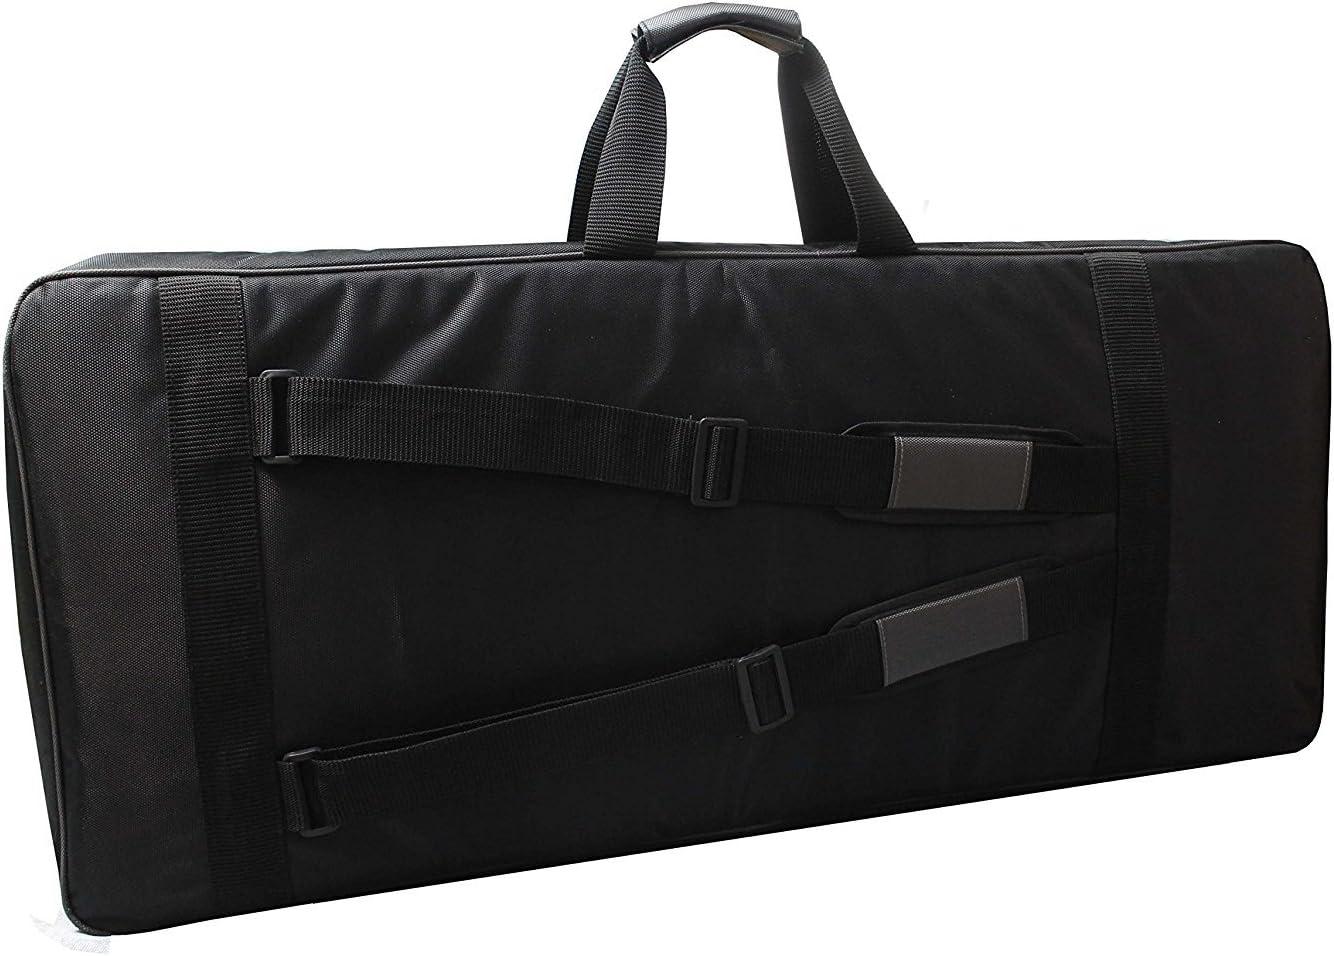 Baritone Distribution Case For Yamaha PSR-EW300 76-key Keyboard Heavy Padded Black Gig Bag